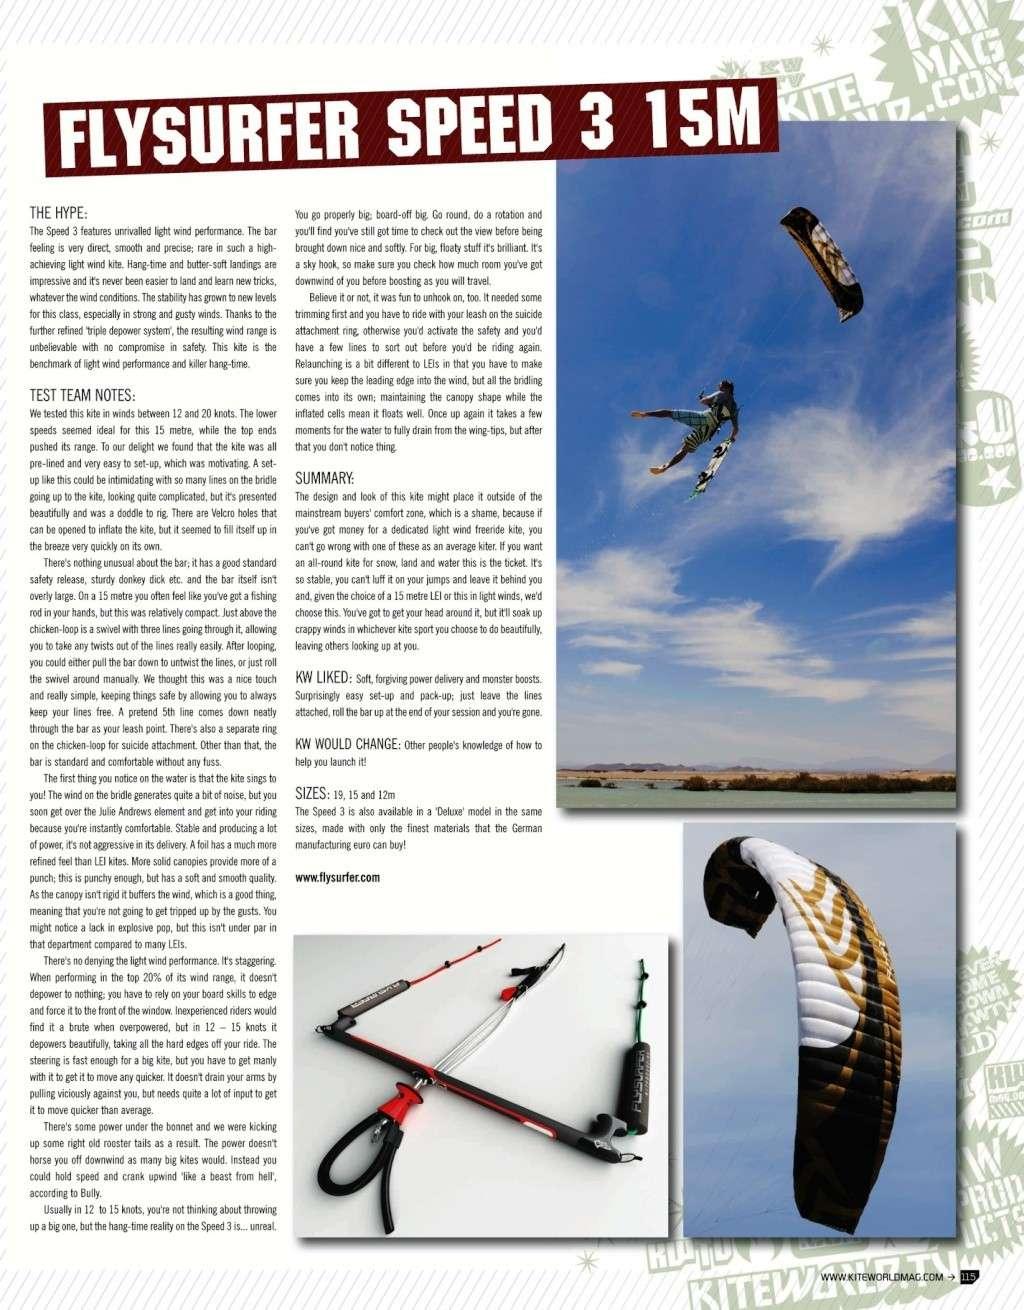 Test Speed 3 15.0 Flysurfer De Luxe Edition - Page 3 Test_s15